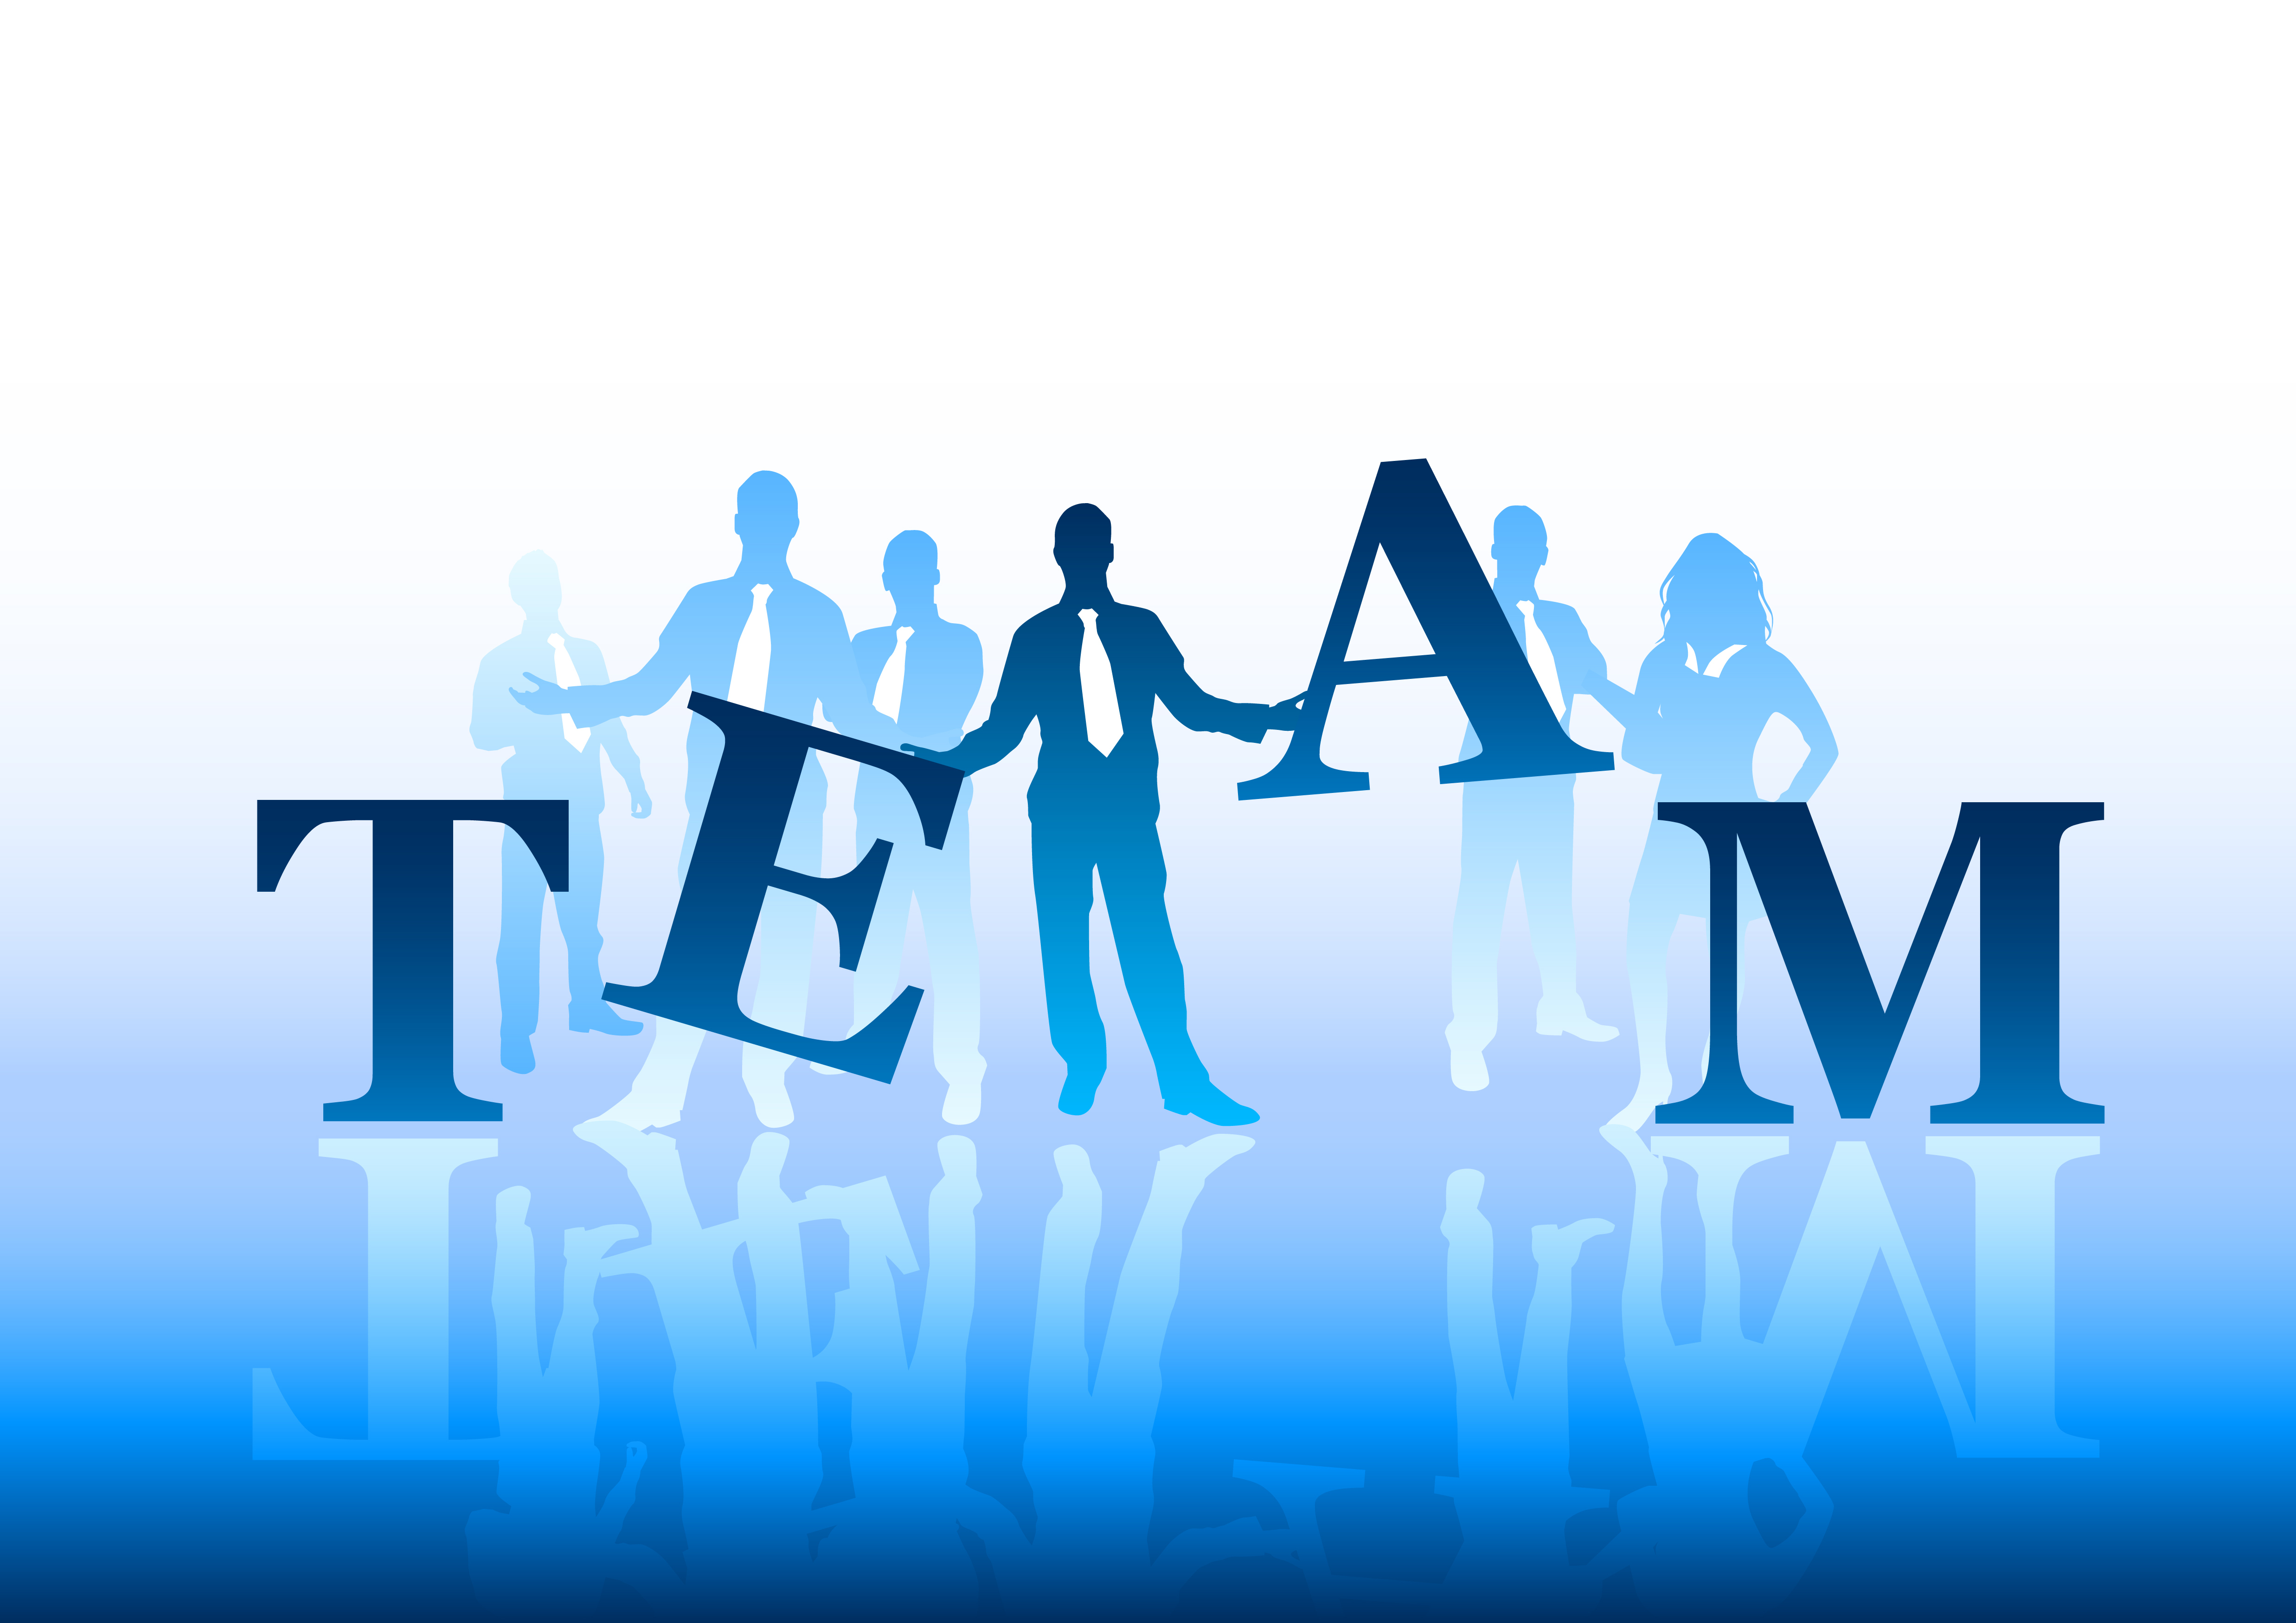 effective team presentations